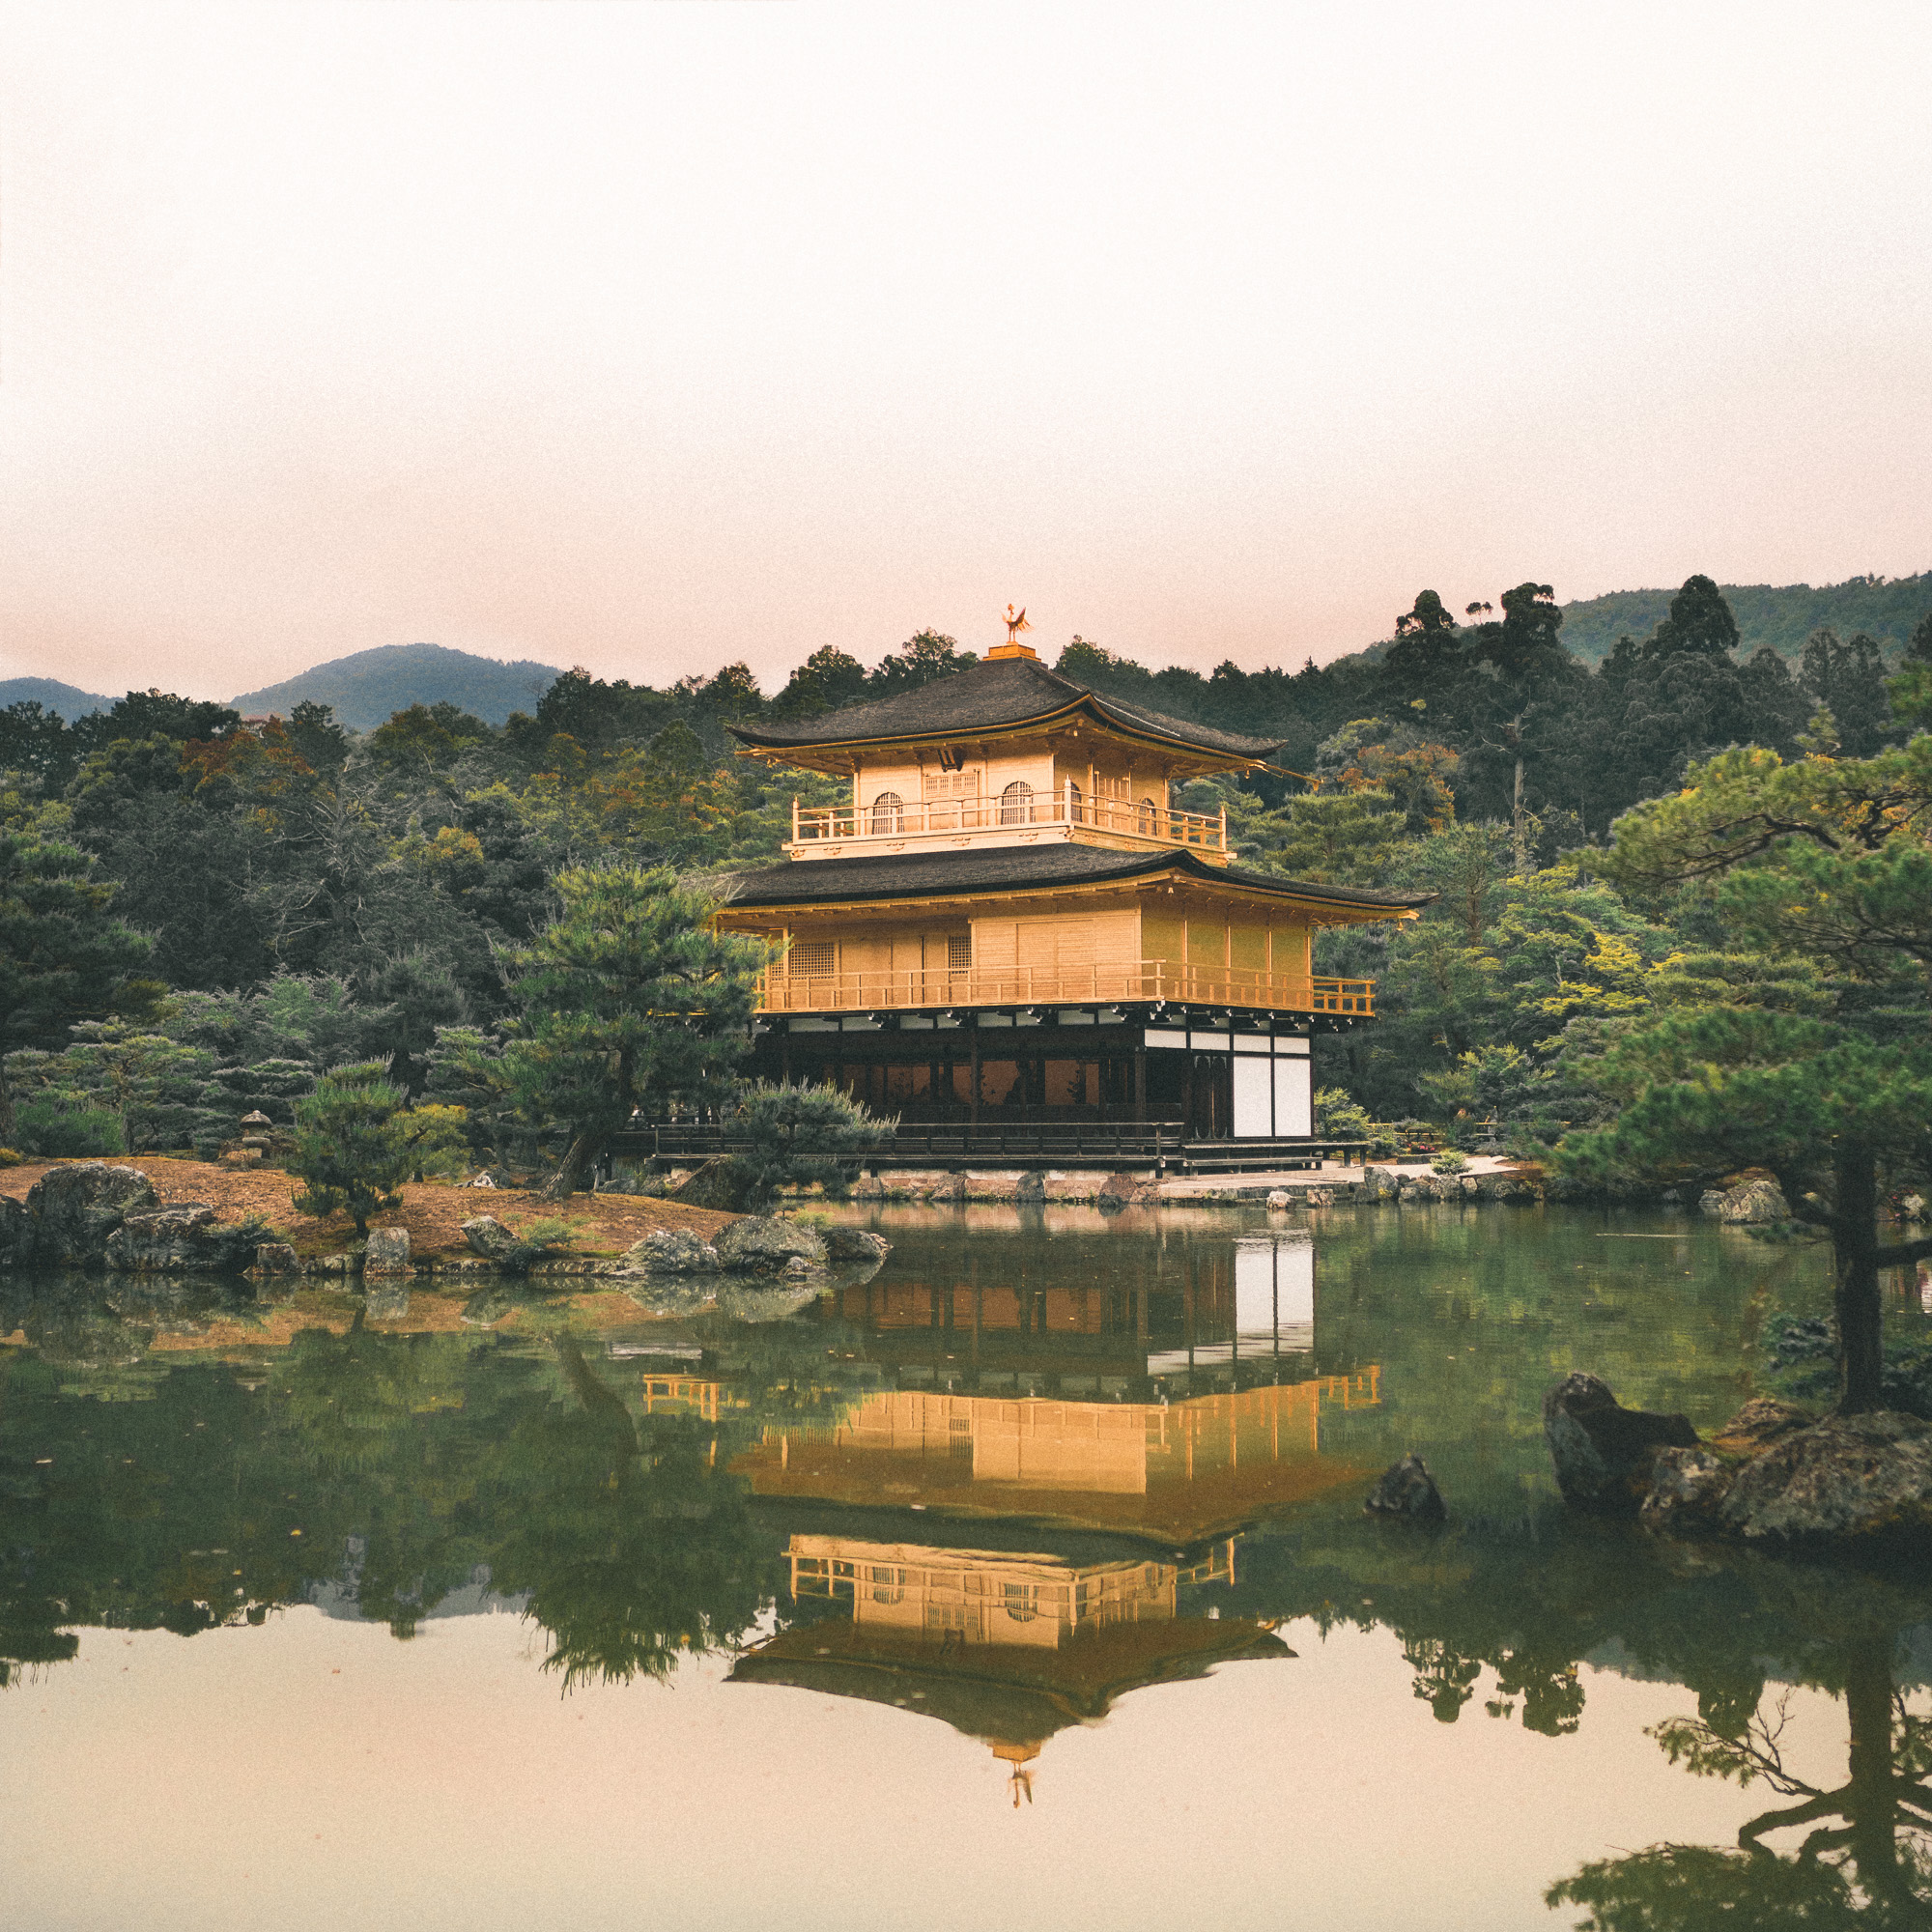 Kinkakuji Golden Temple in Kyoto, Japan | 24 Hour Guide to Kyoto, Japan | 1 Day Guide Kyoto | Kyoto City Guide | Kyoto Travel Itinerary